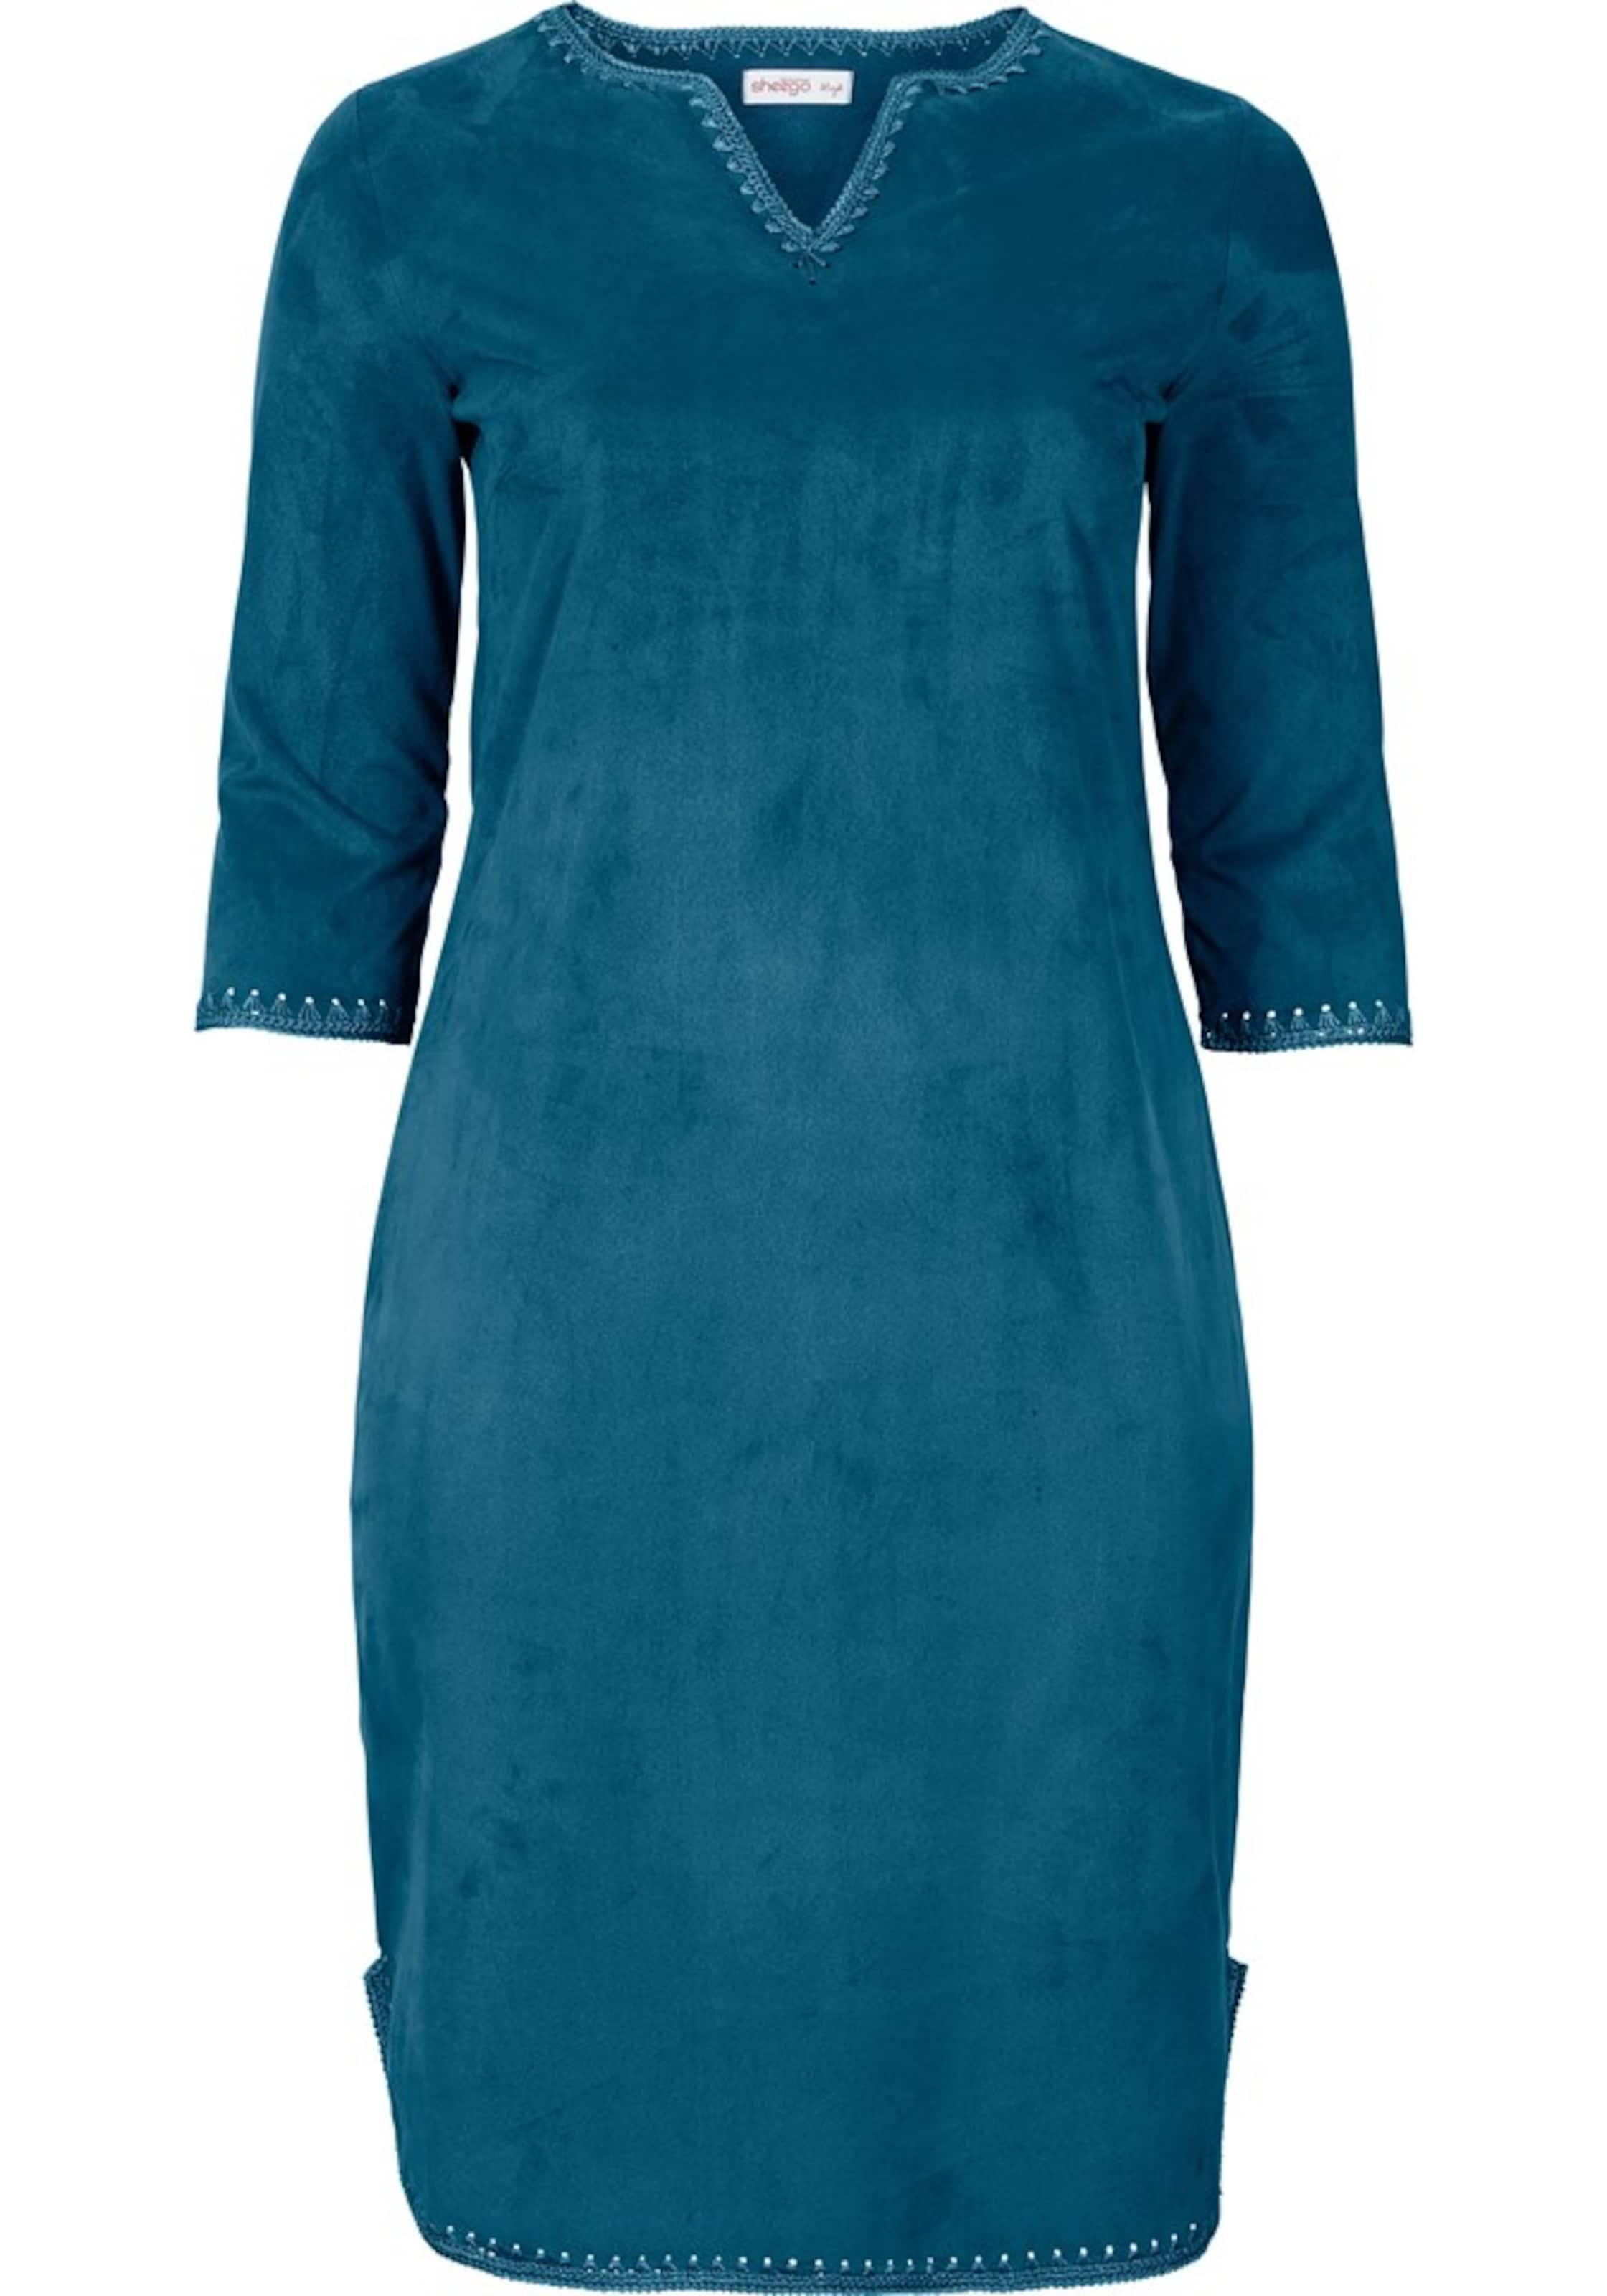 Himmelblau In Kleid Style Sheego Sheego Kleid Sheego Himmelblau Style In Style Kleid YWD2eEHI9b